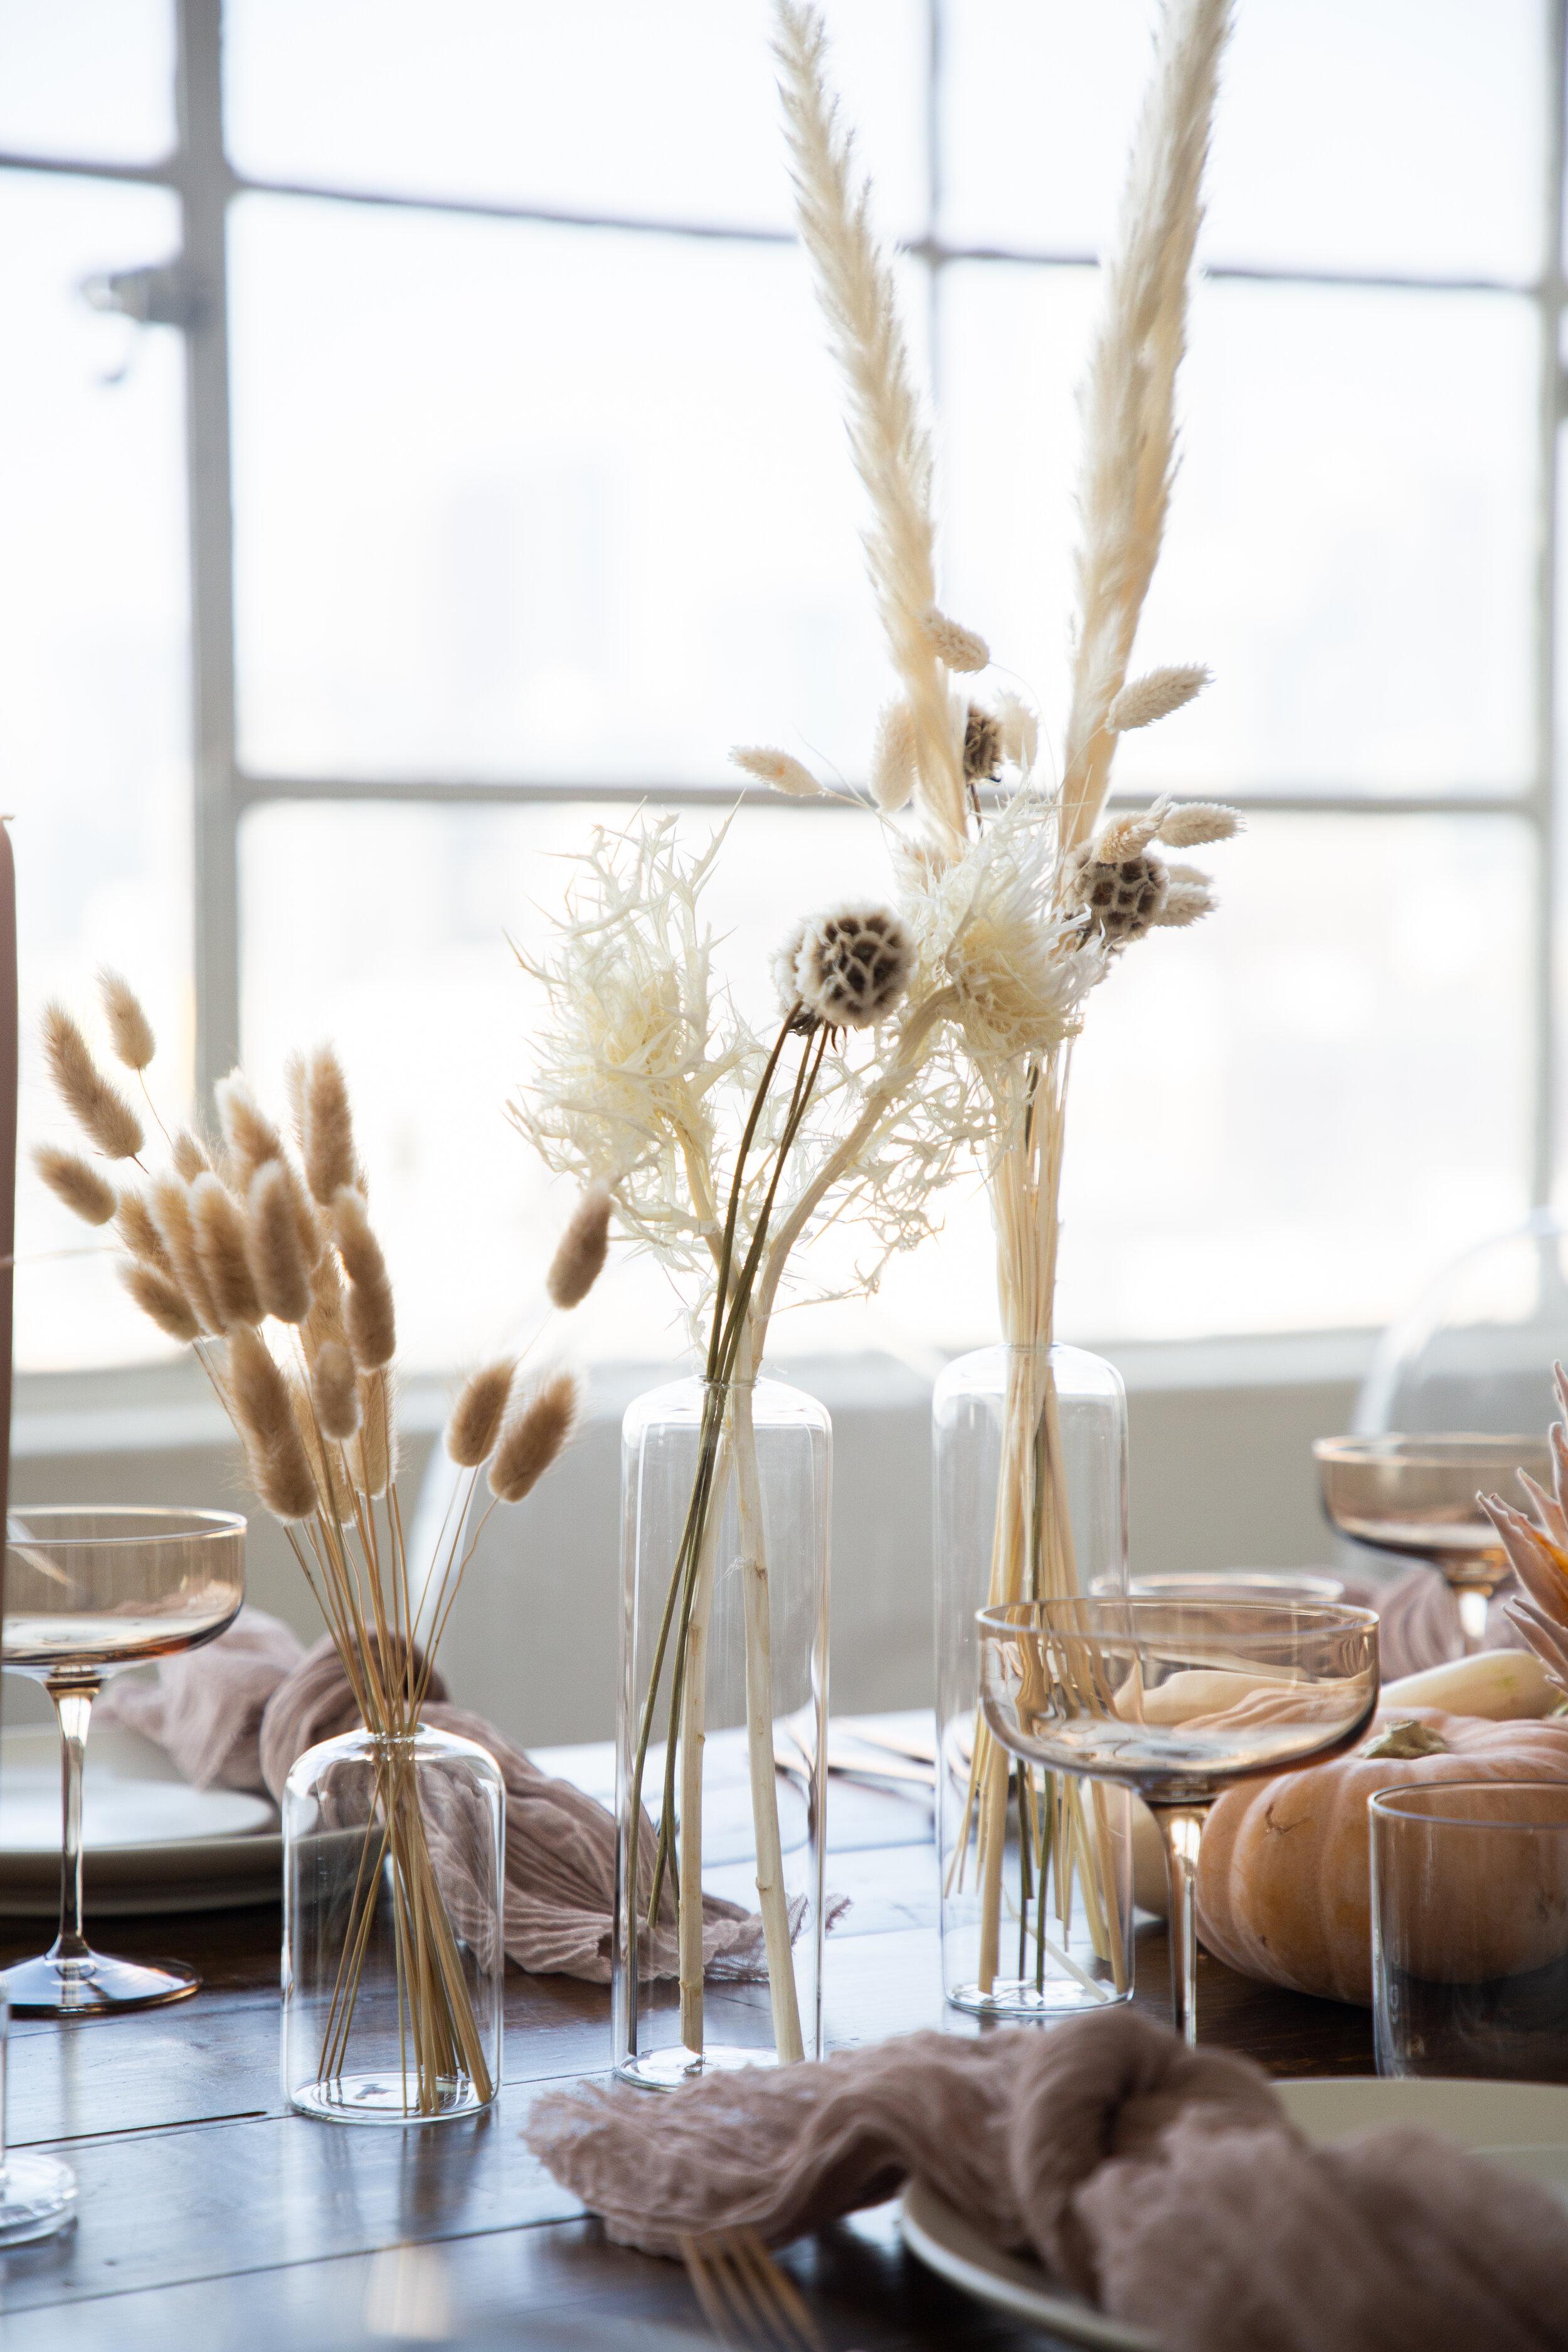 acme real estate blog post thanksgiving decor interior